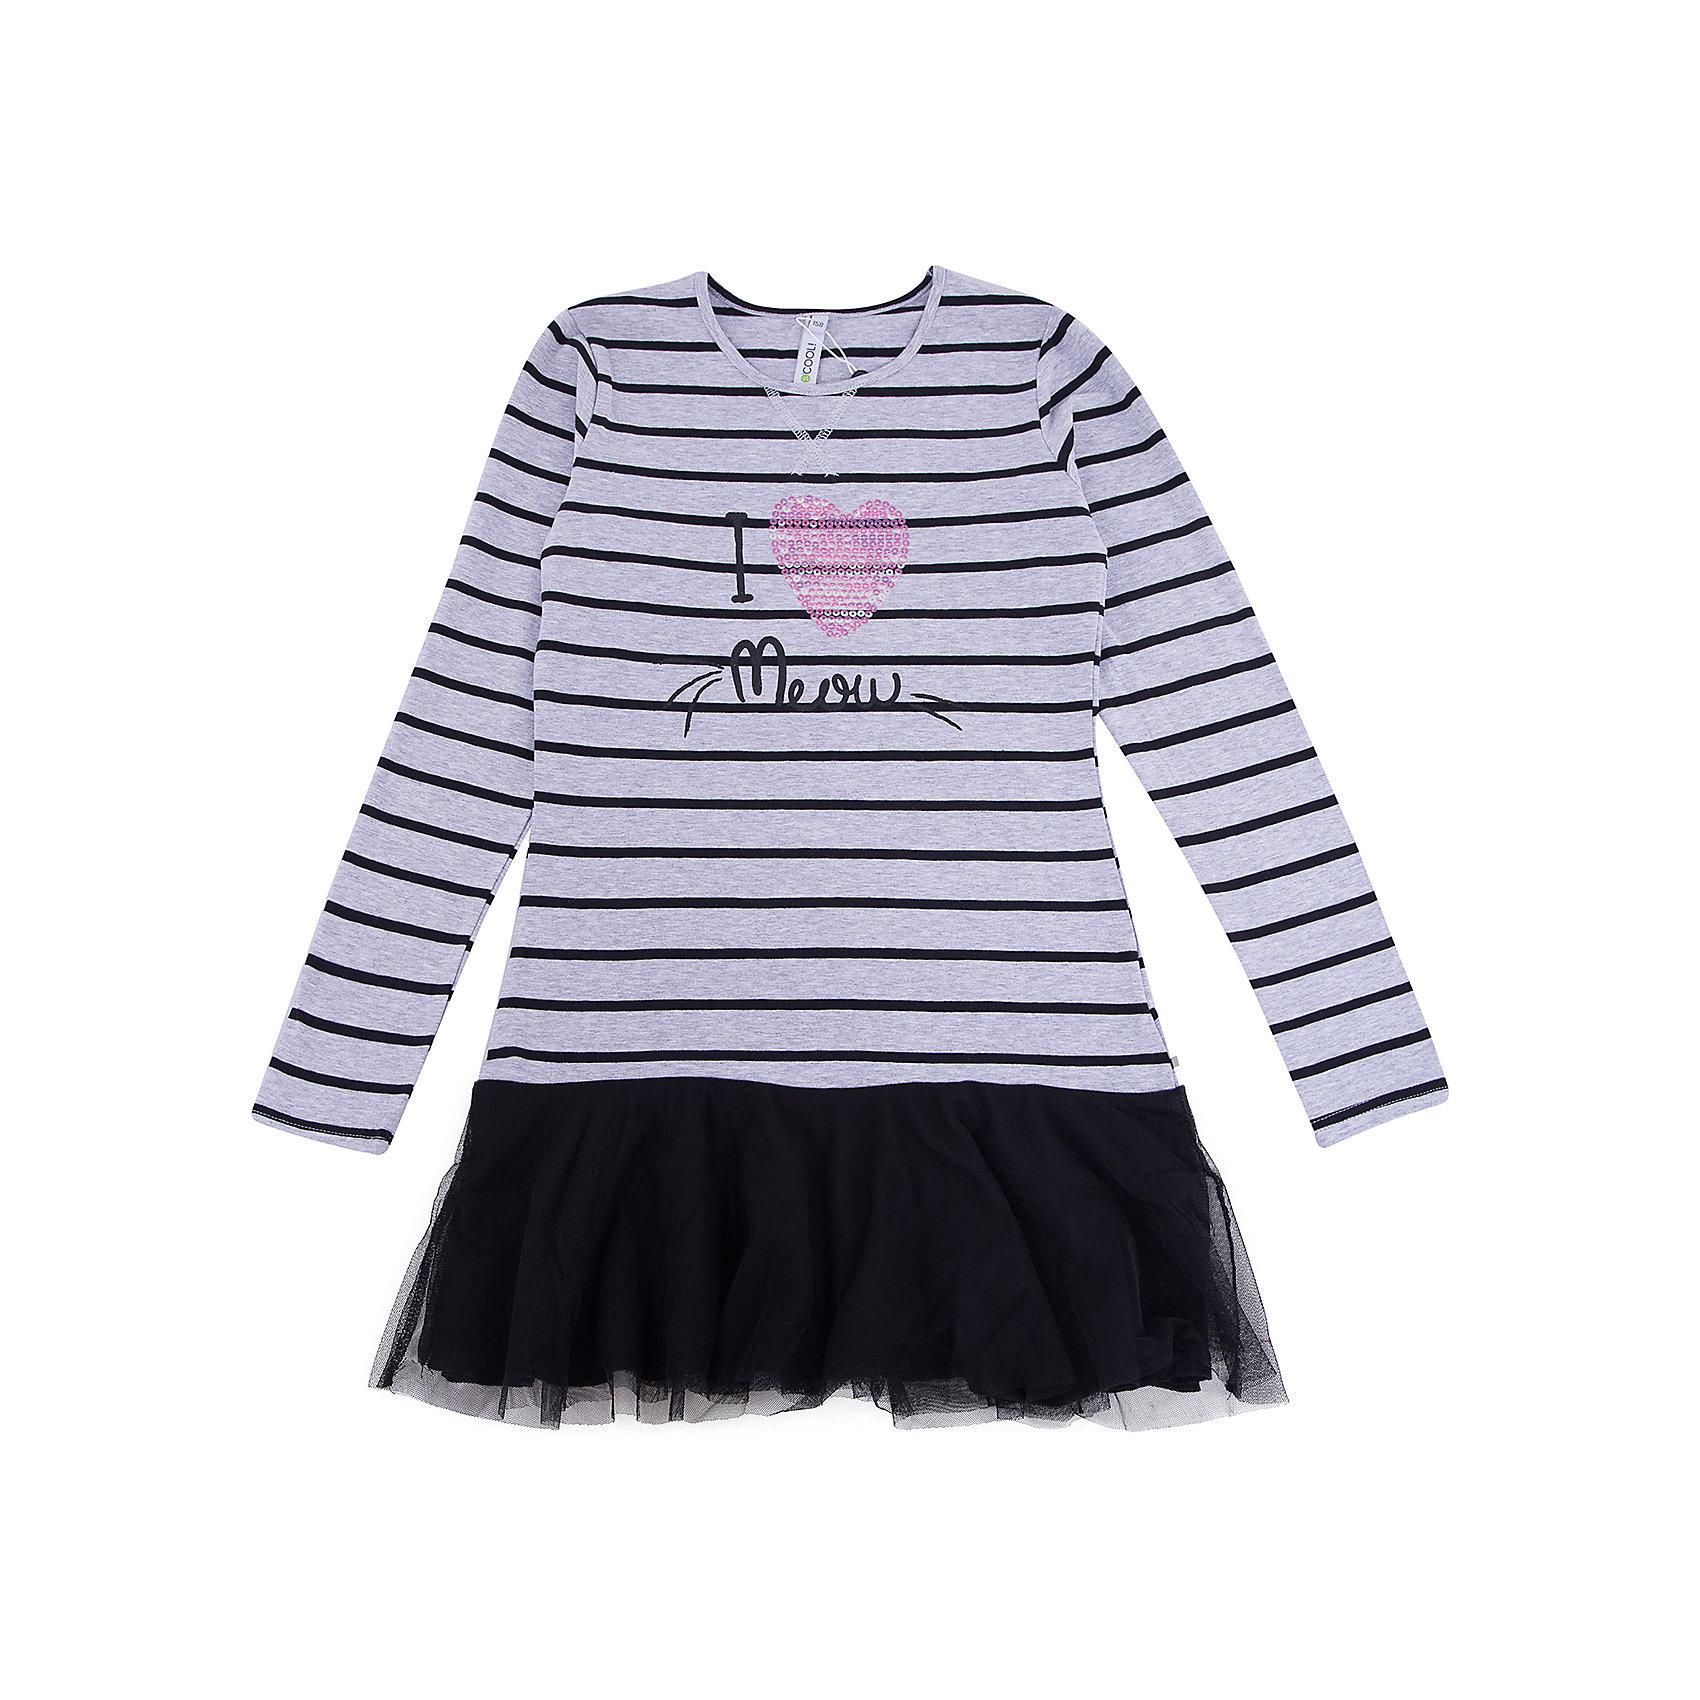 S'cool Платье для девочки S'cool